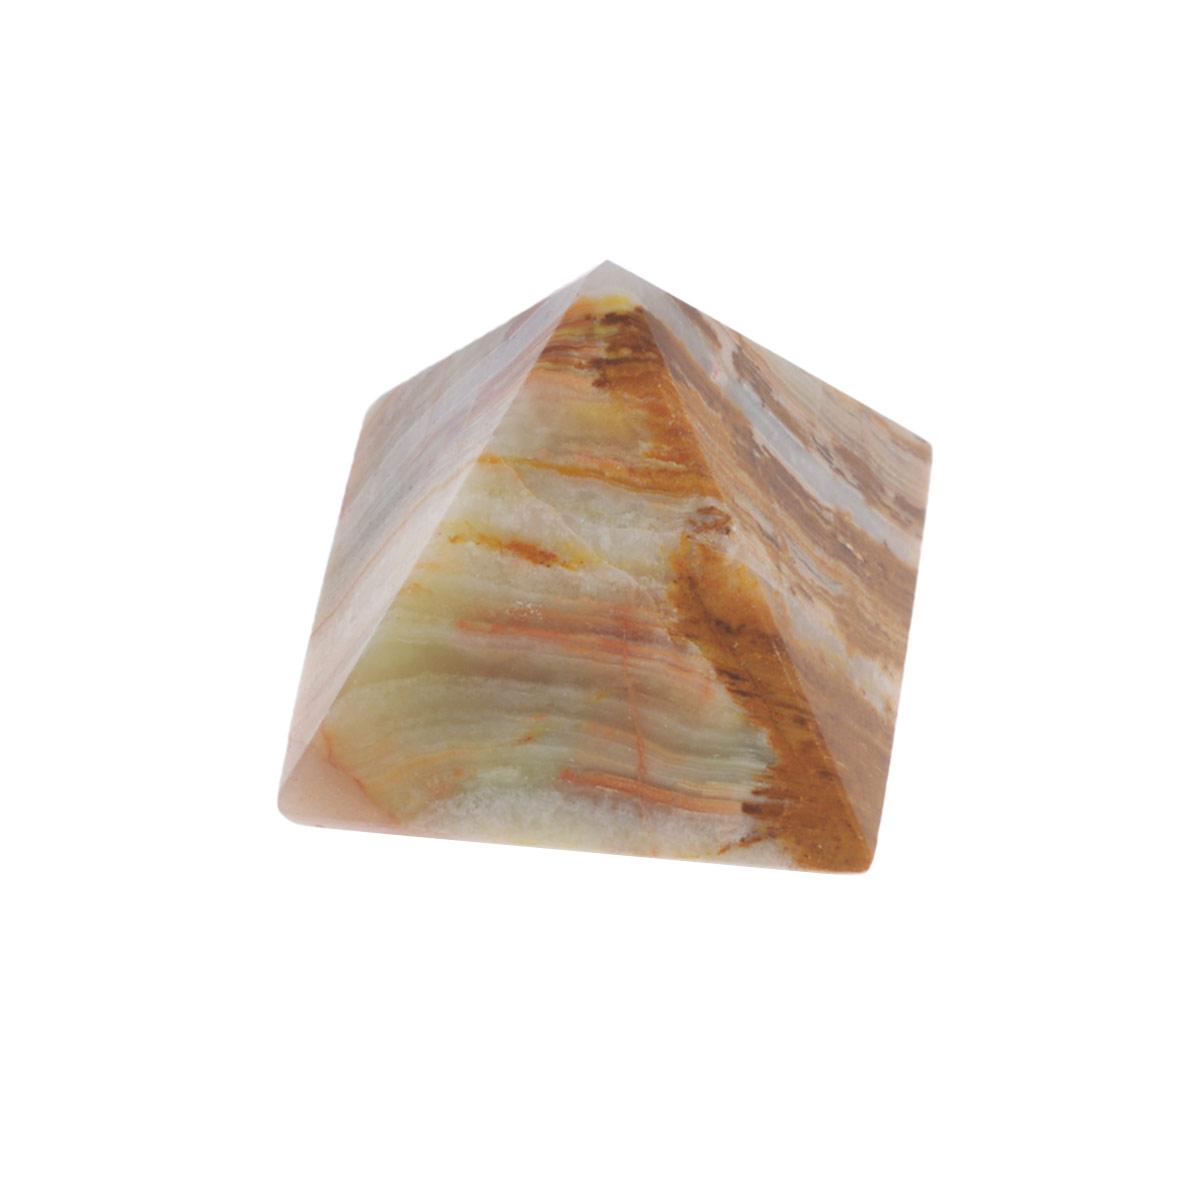 Сувенир Sima-land Пирамида, 3 см х 3 см х 3,5 см сувенир яблоко из оникса значение